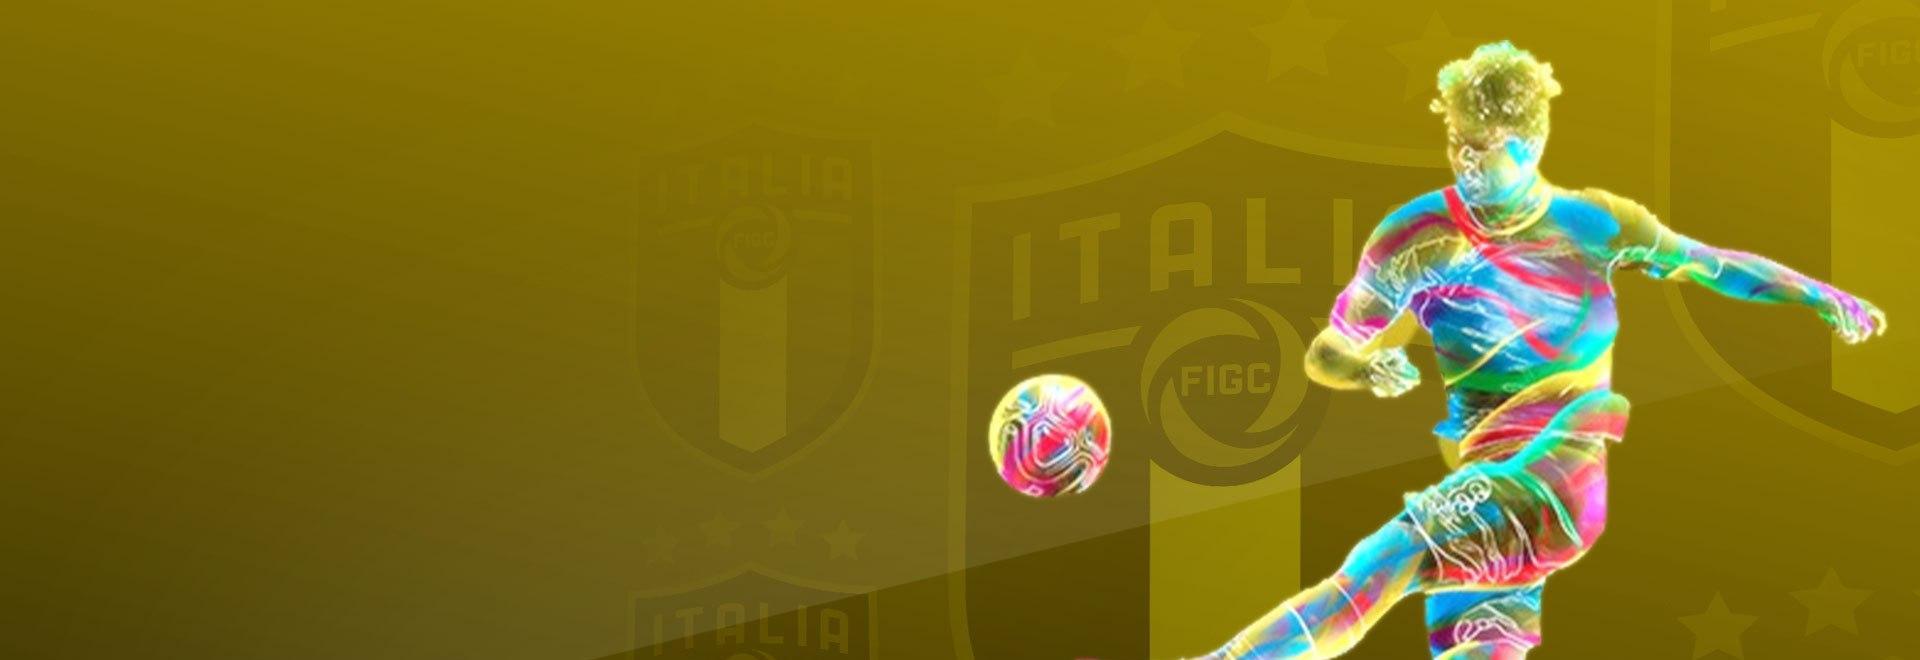 Campionato U17 Serie C